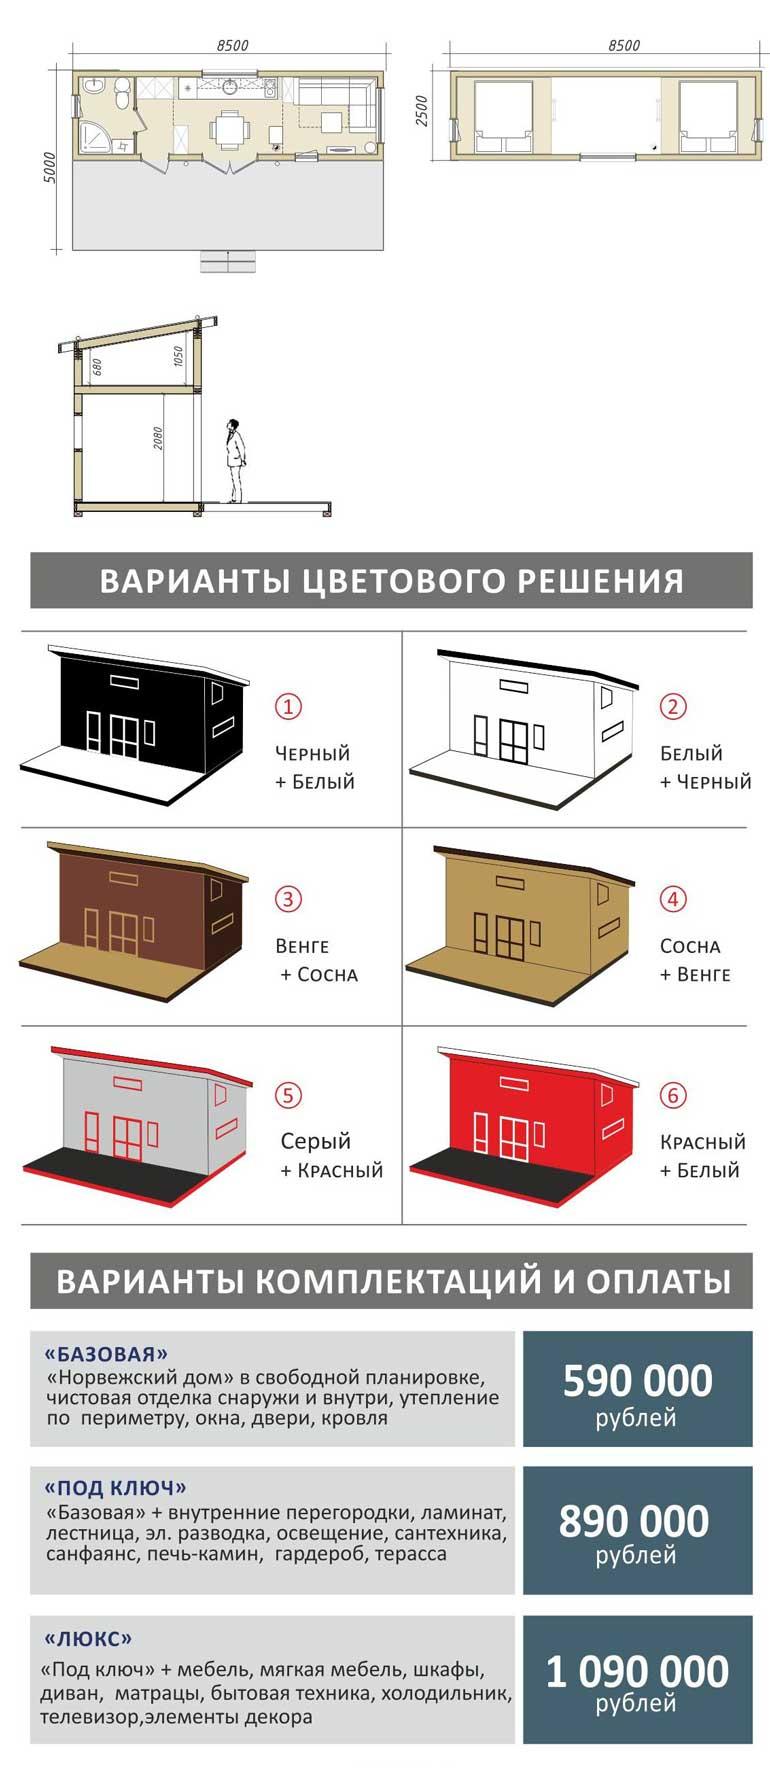 norvezhskiy-dom-29-modum-montazh-za-1-den